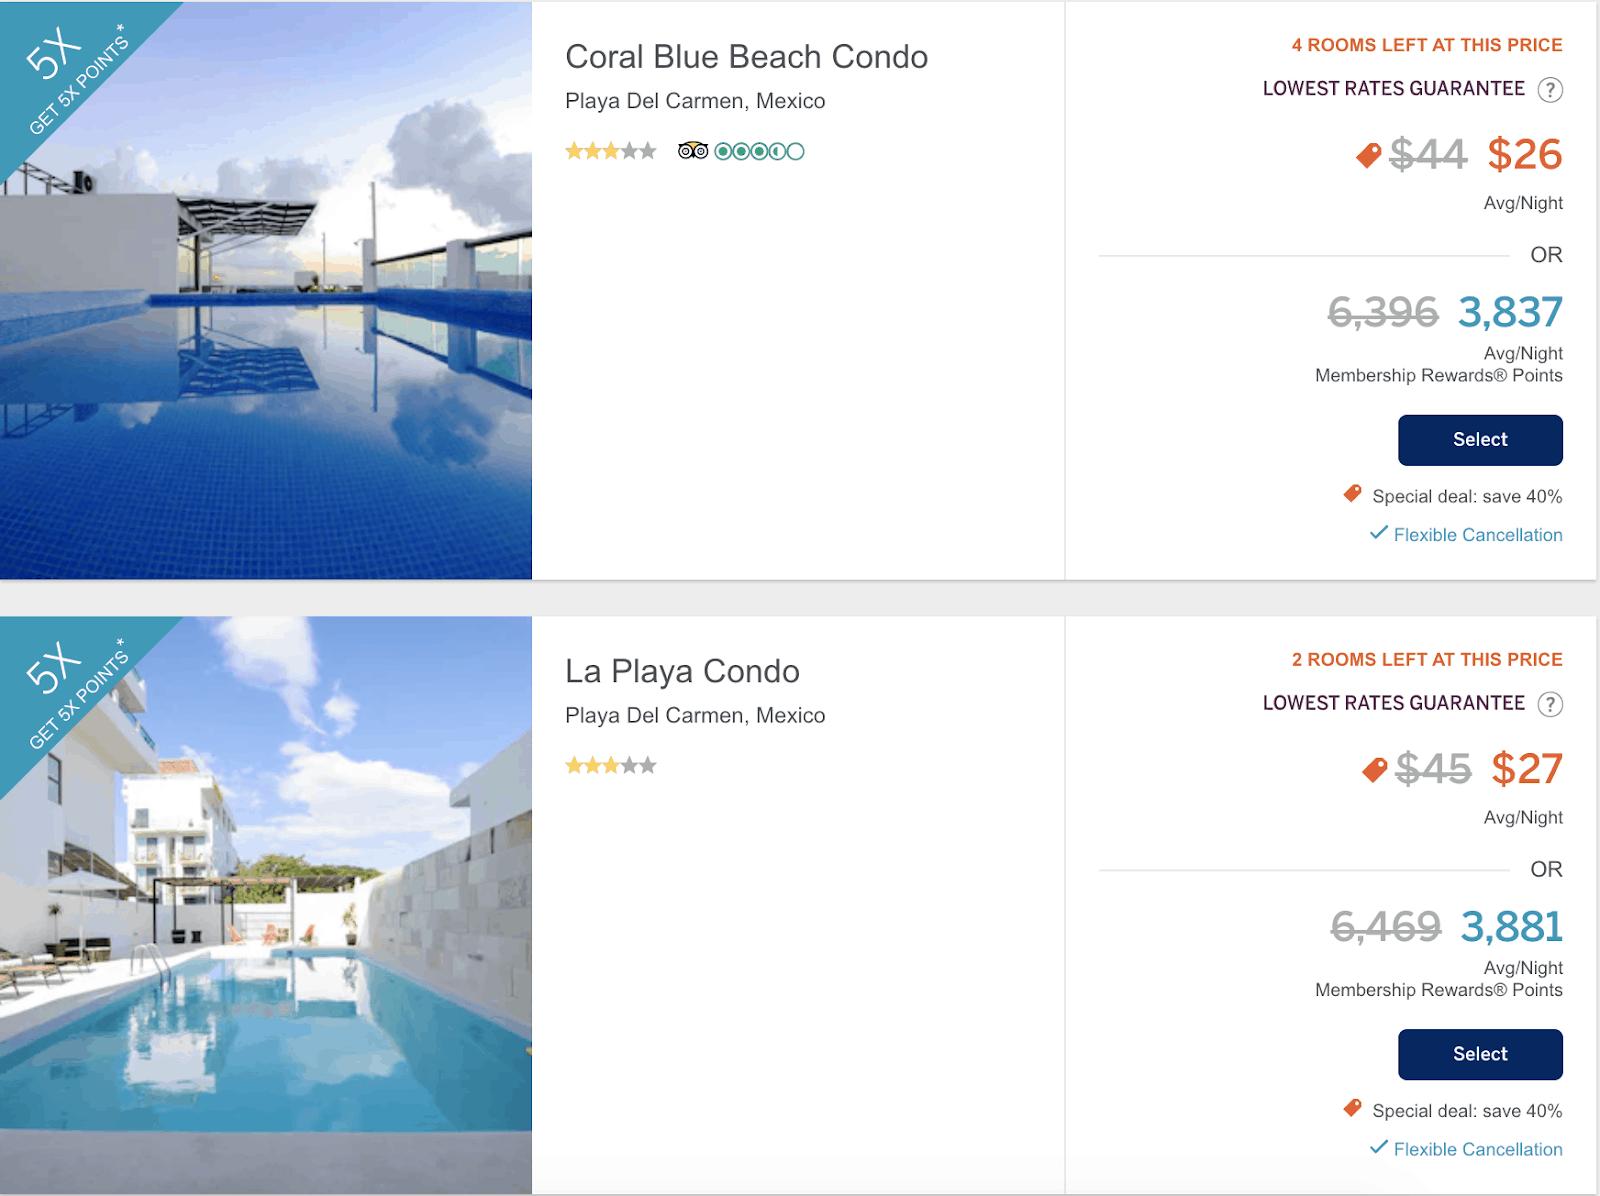 04. Amex travel hotels